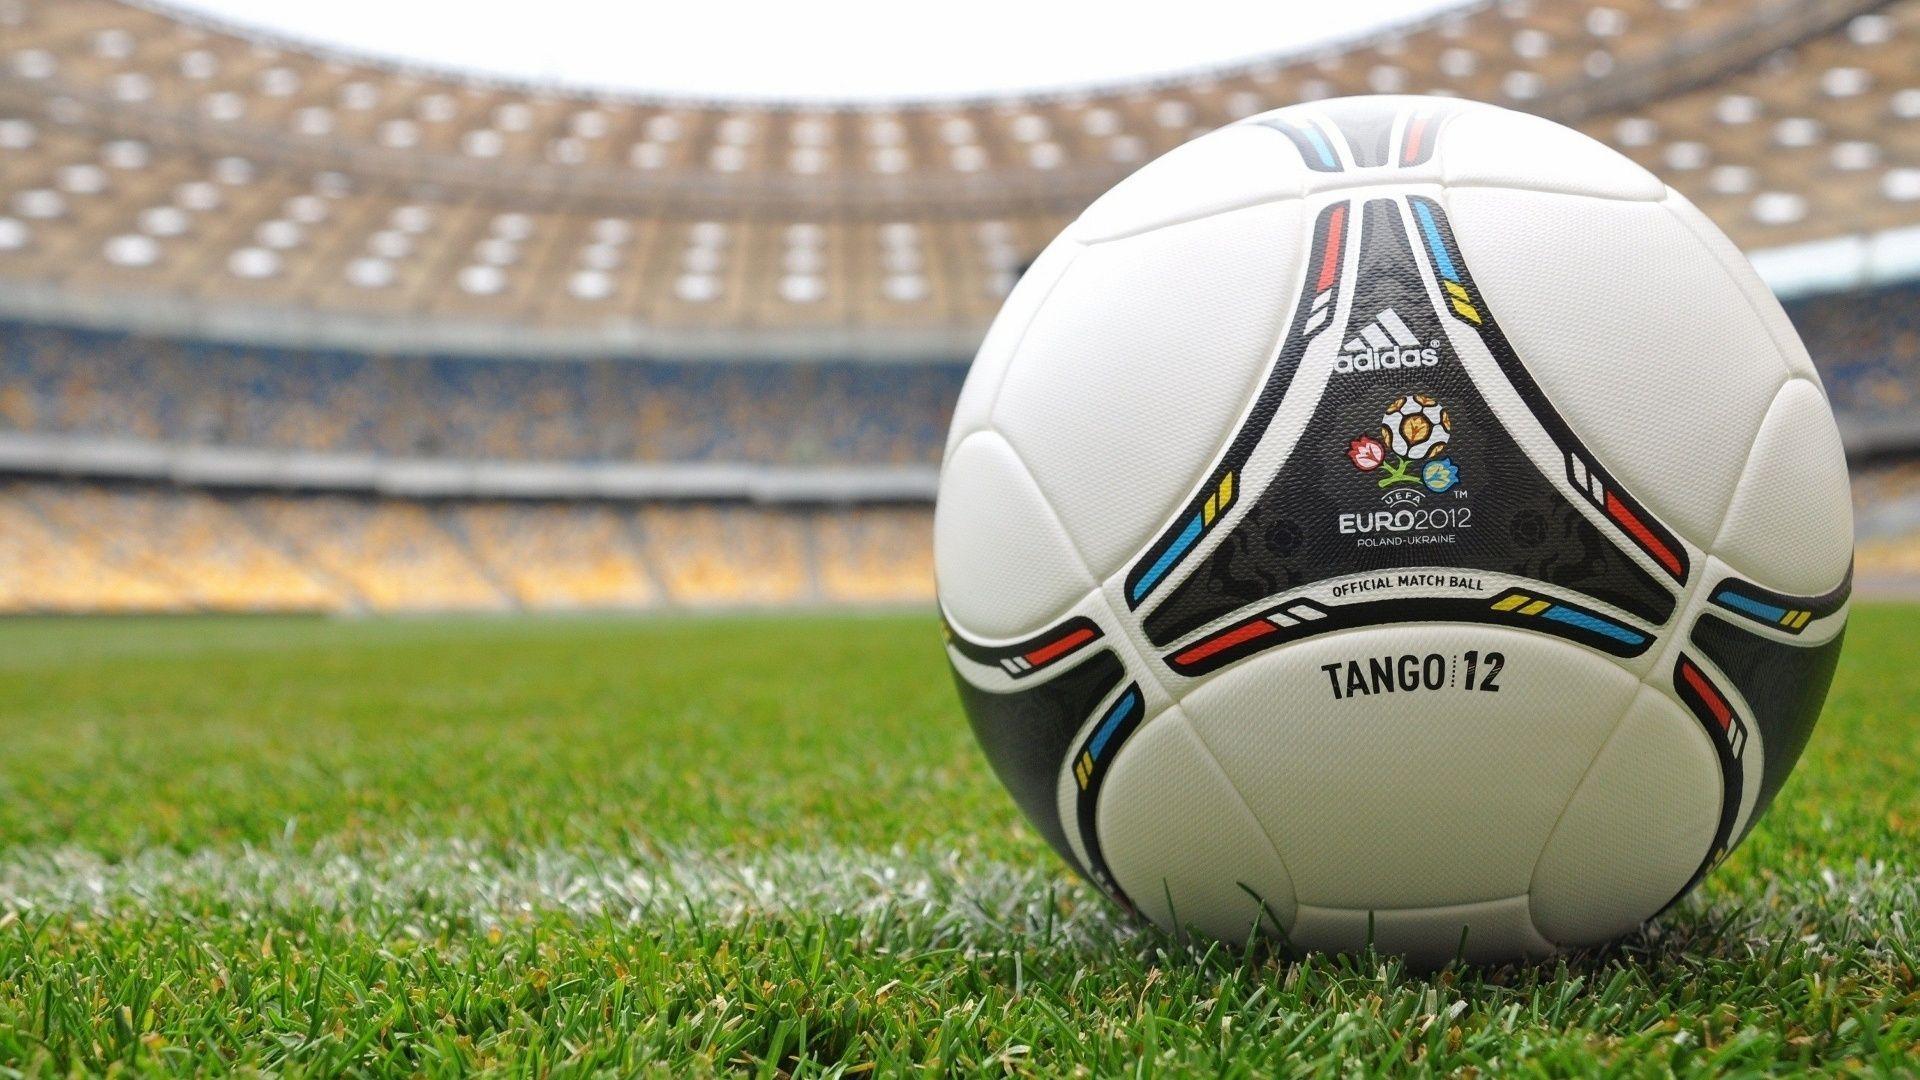 Home | over 2 5 goals system tips | Football wallpaper, Soccer ball